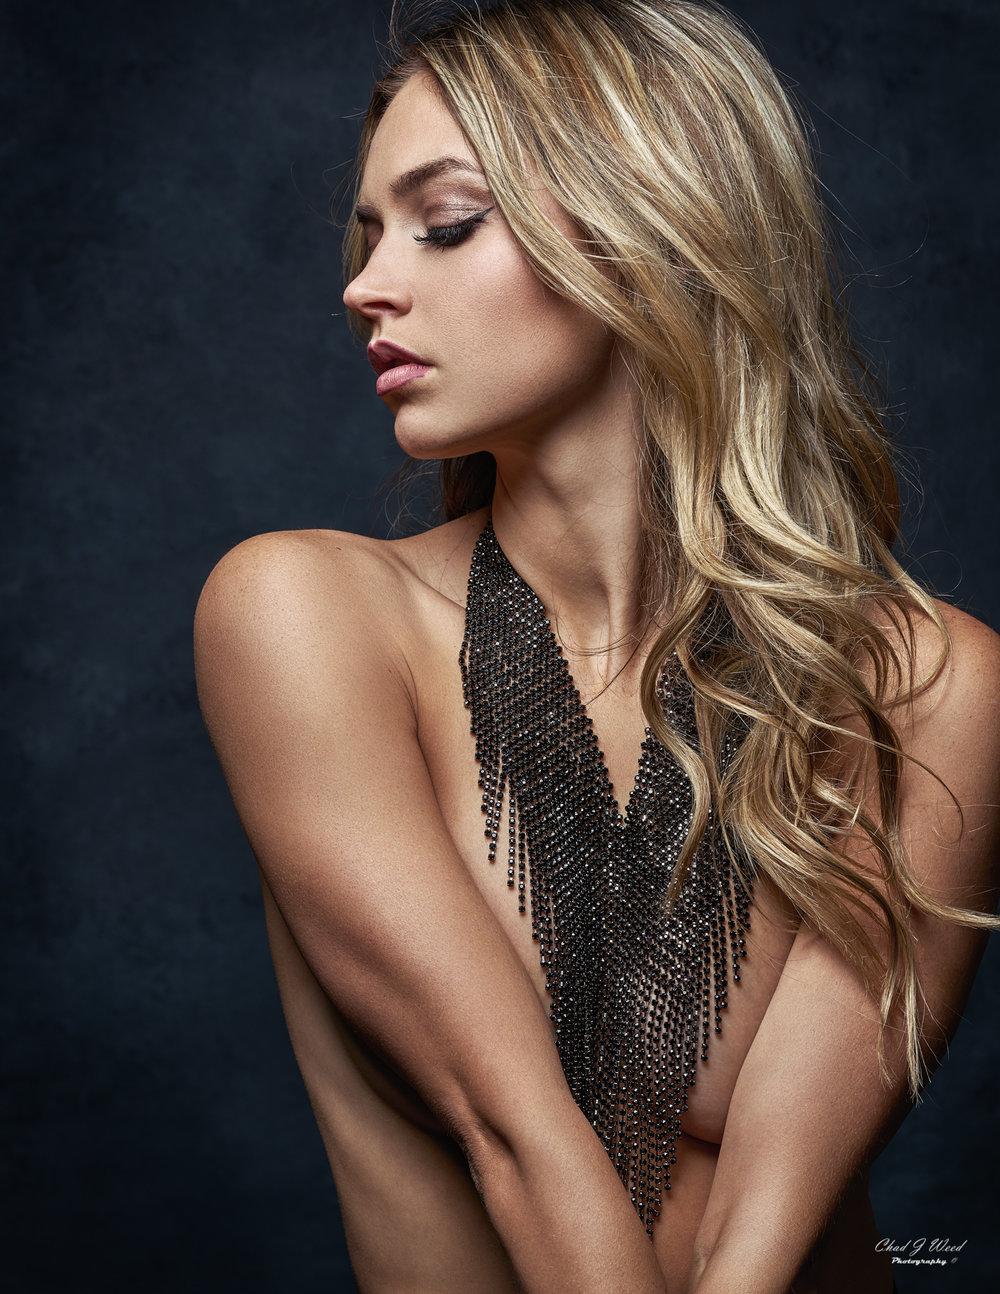 Model Shea by Mesa Arizona Beauty Photographer Chad Weed